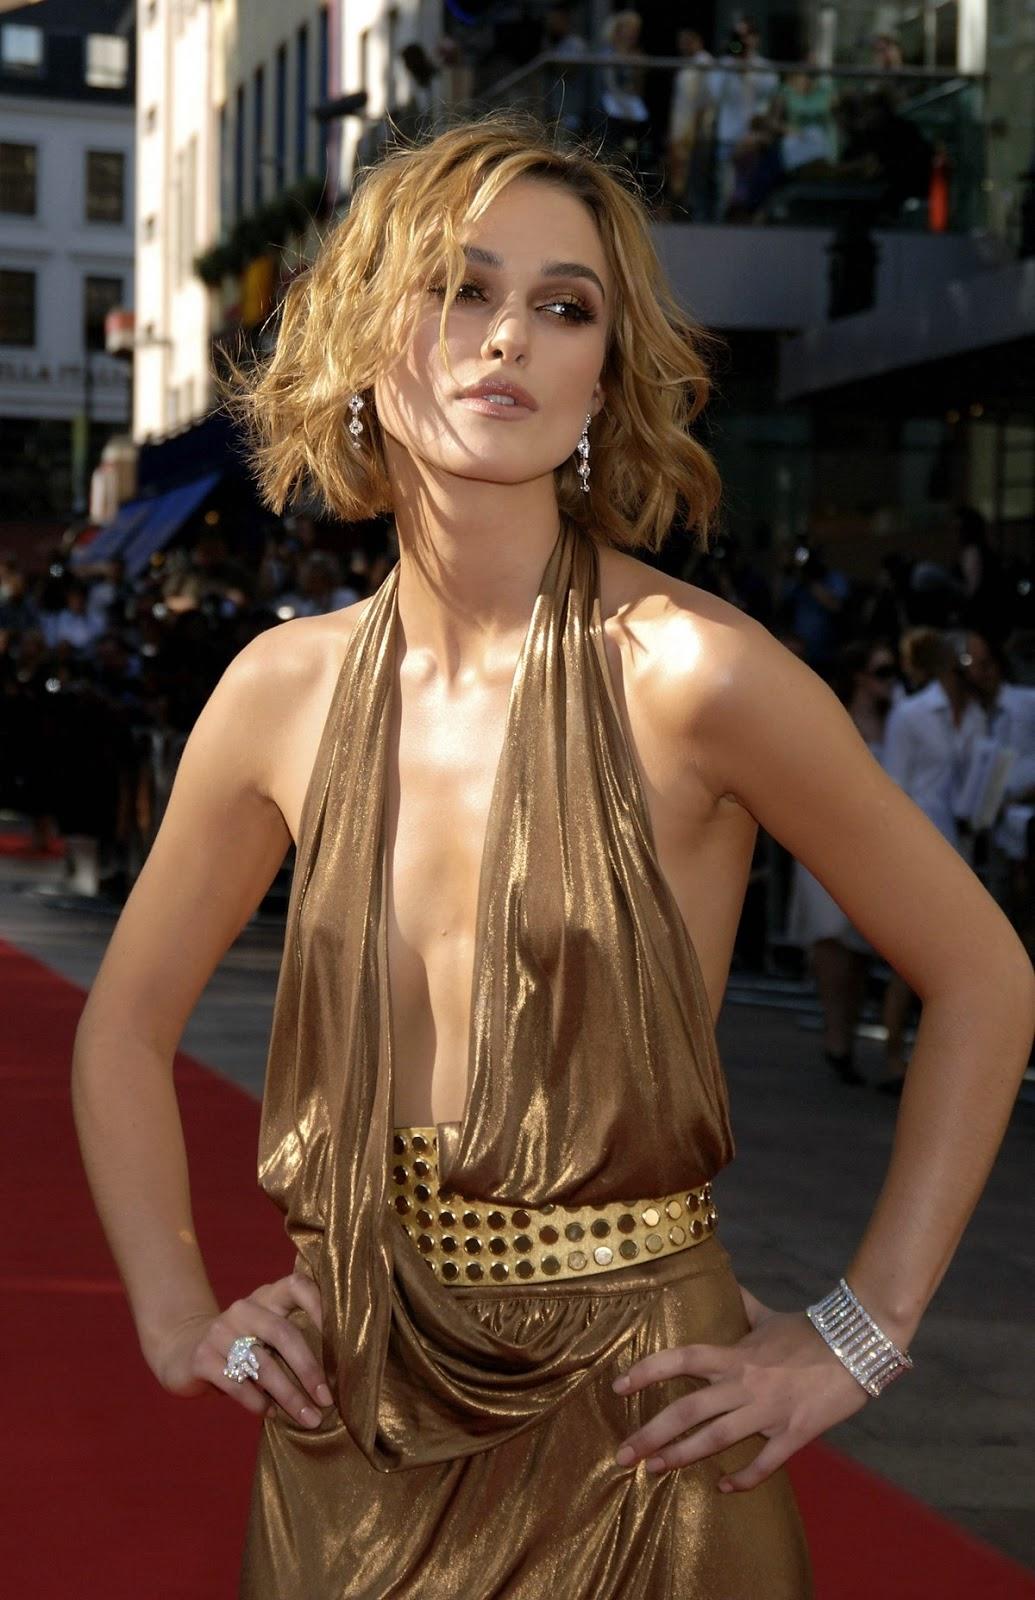 Keira Knightley: Keira Knightley breast pics